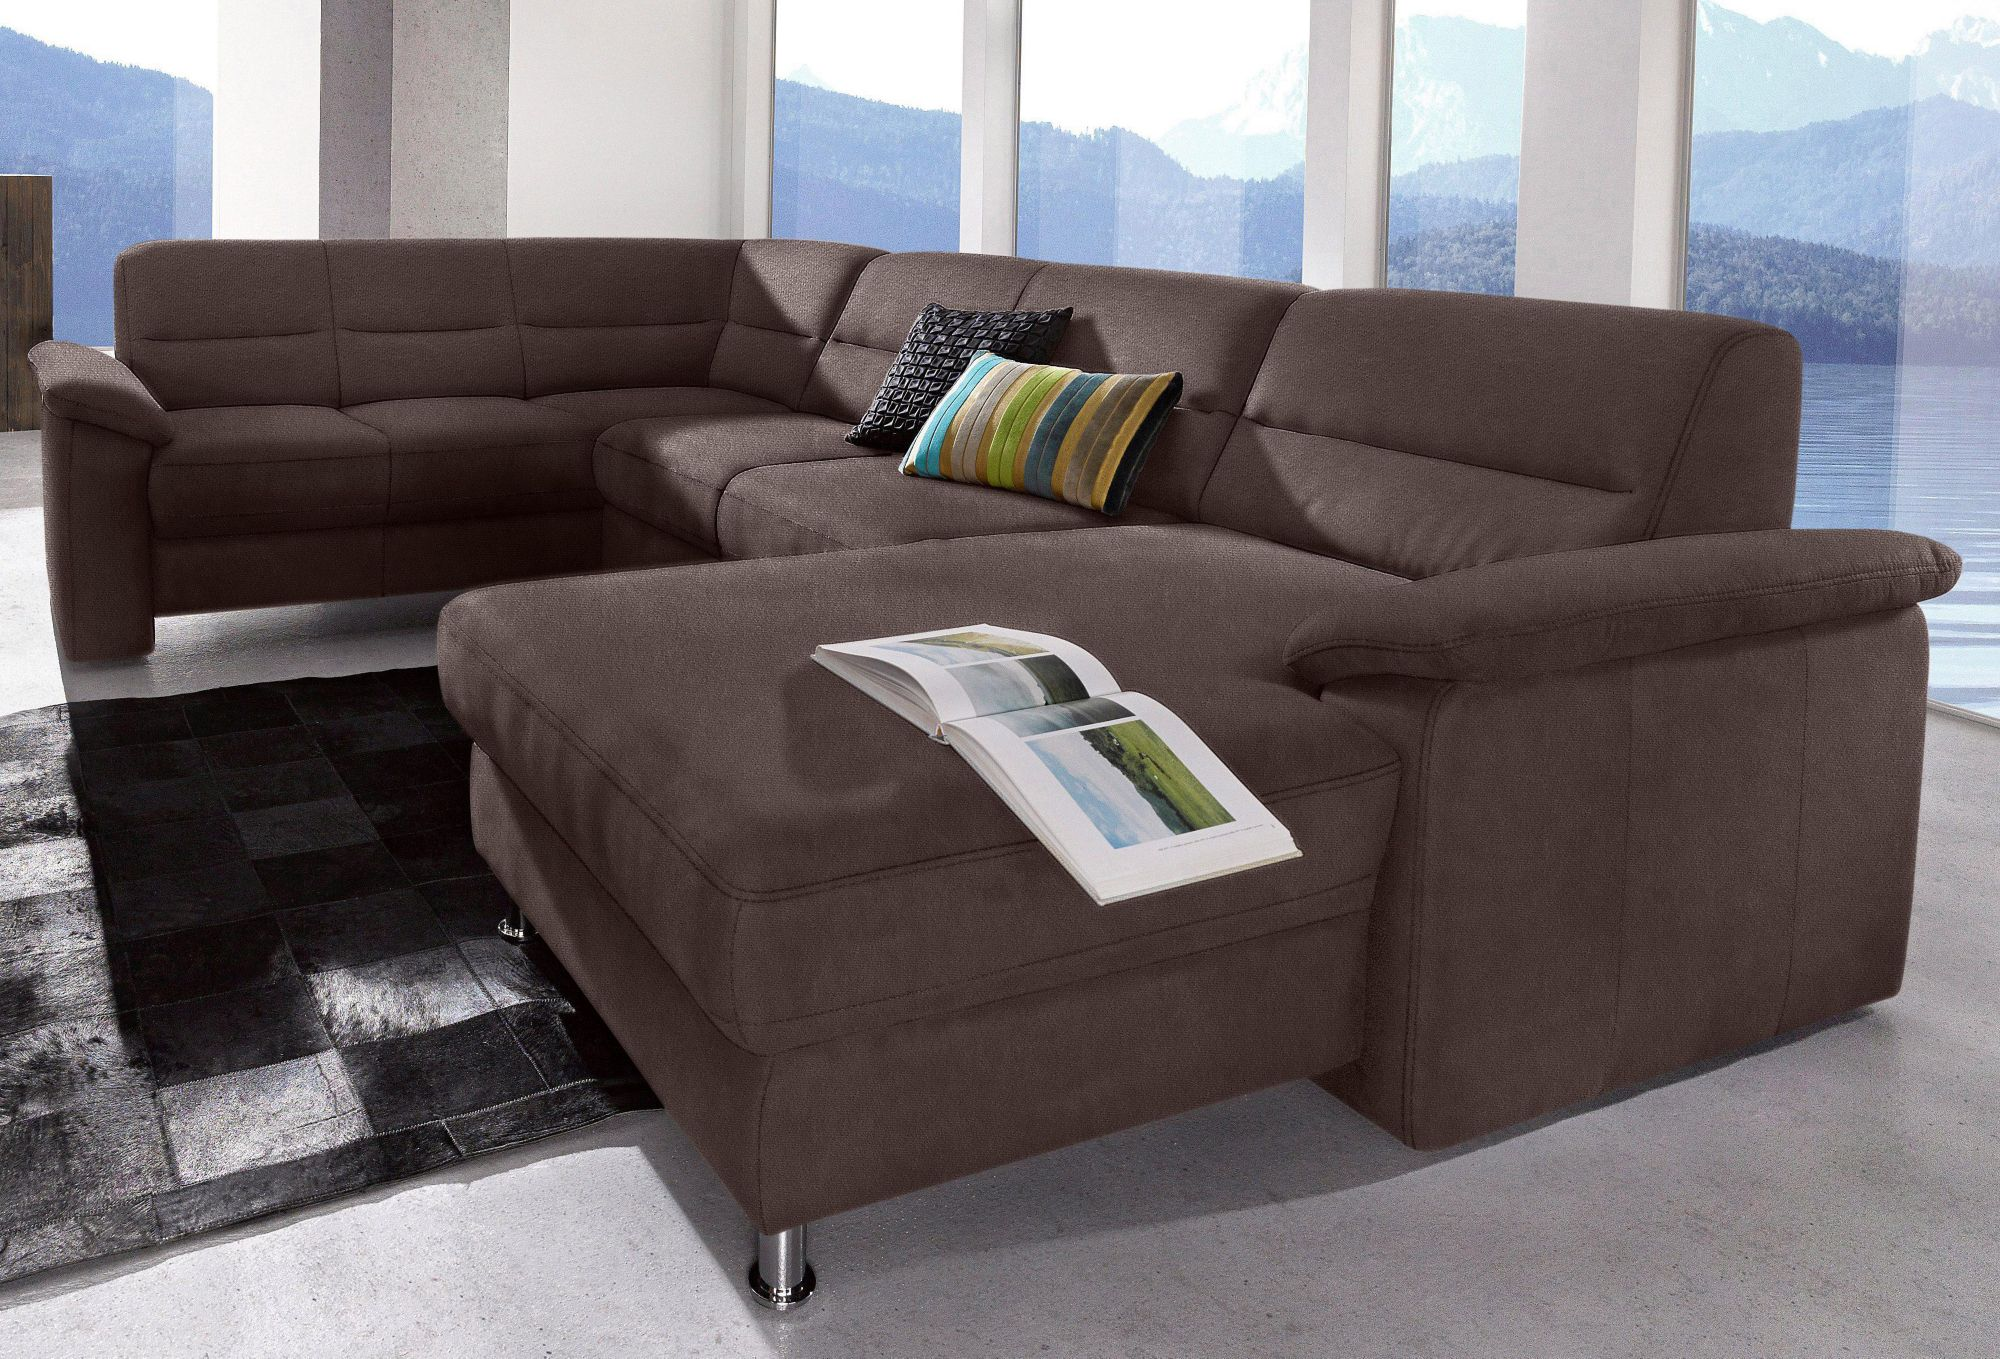 wohnlandschaft sit more inklusive boxspring polsterung schwab versand sofas couches. Black Bedroom Furniture Sets. Home Design Ideas